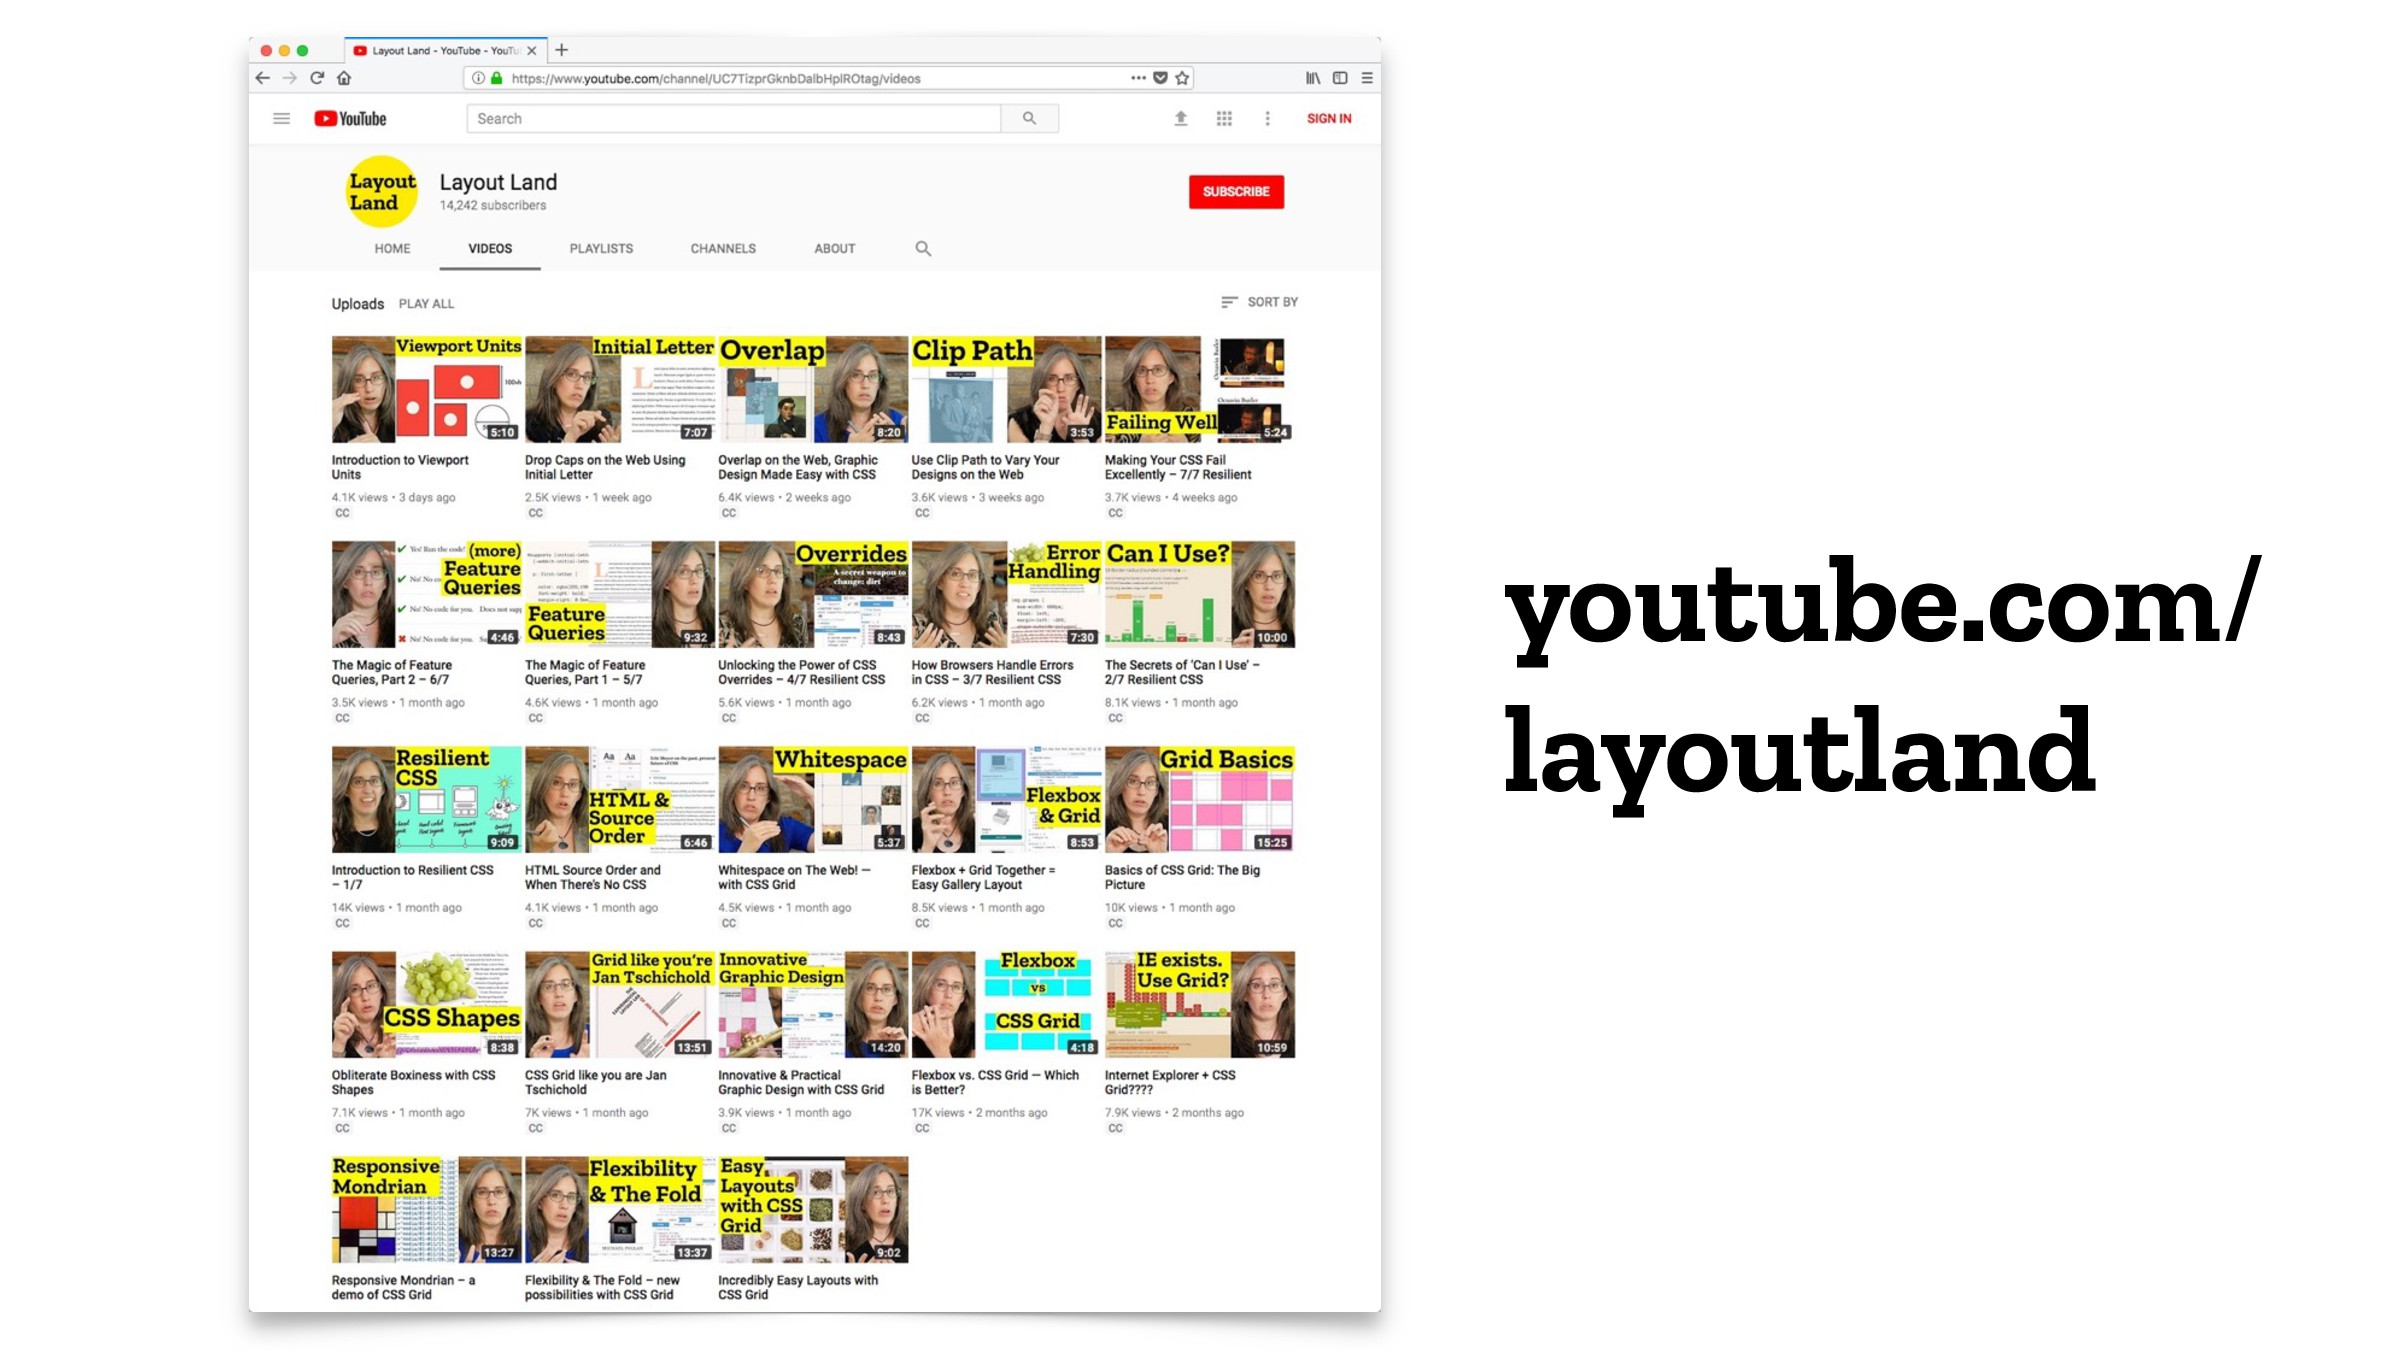 youtube.com/ layoutland